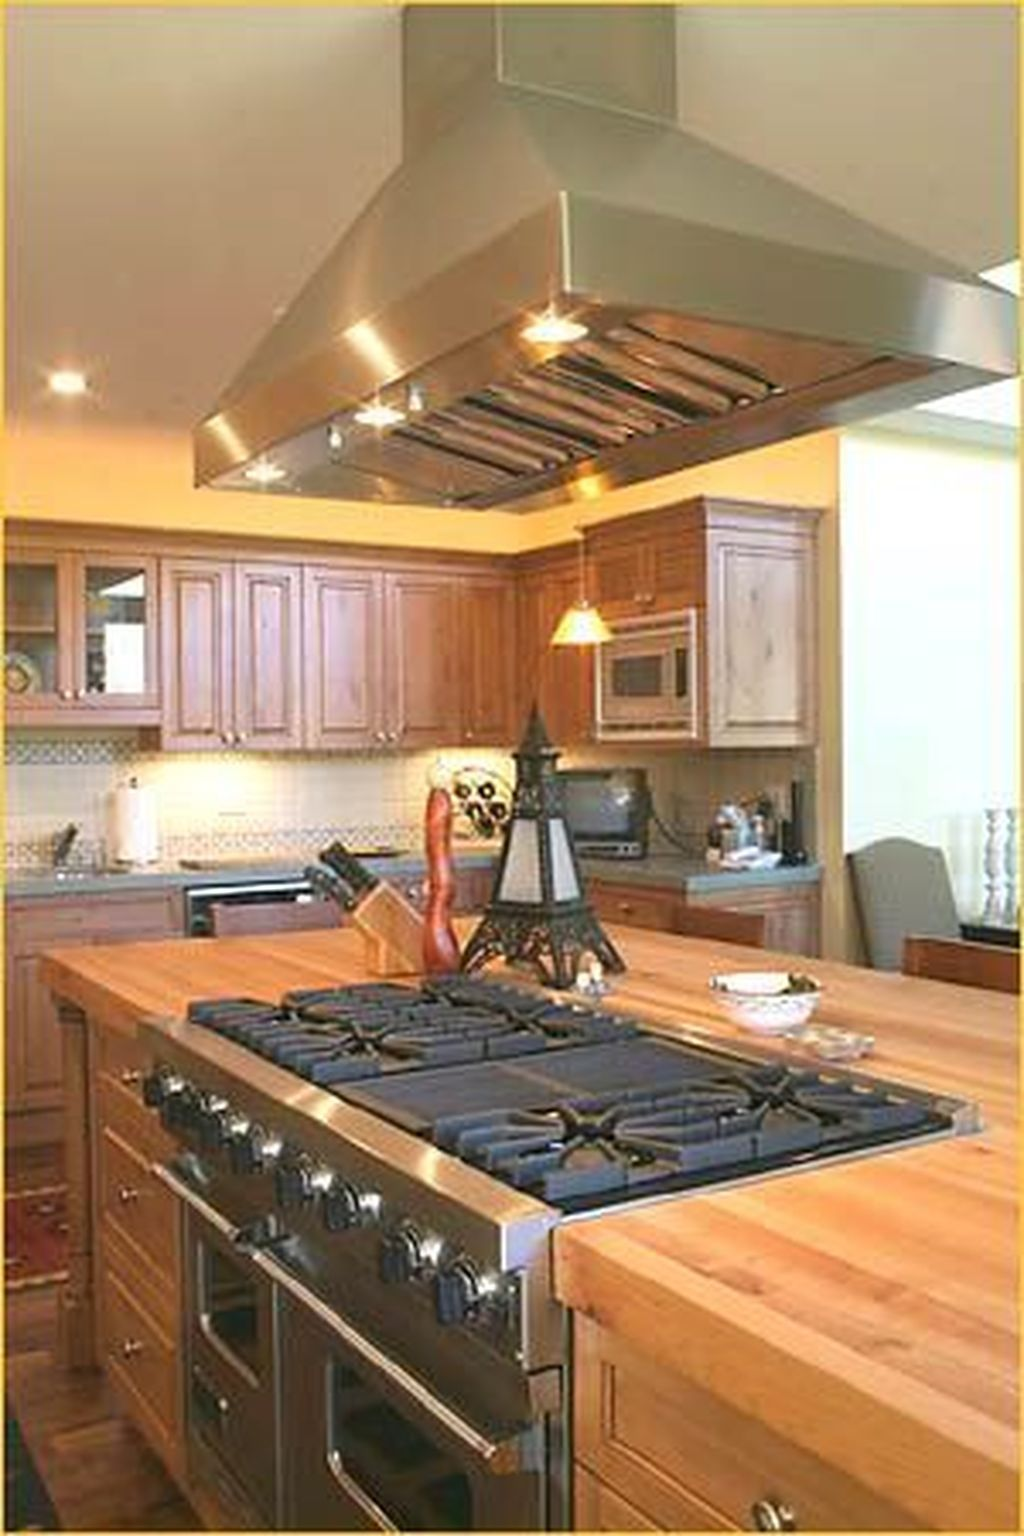 awesome rustic kitchen island design ideas also homedecor kitchenisland kitchenpeninsula kitchenroomimages rh pinterest